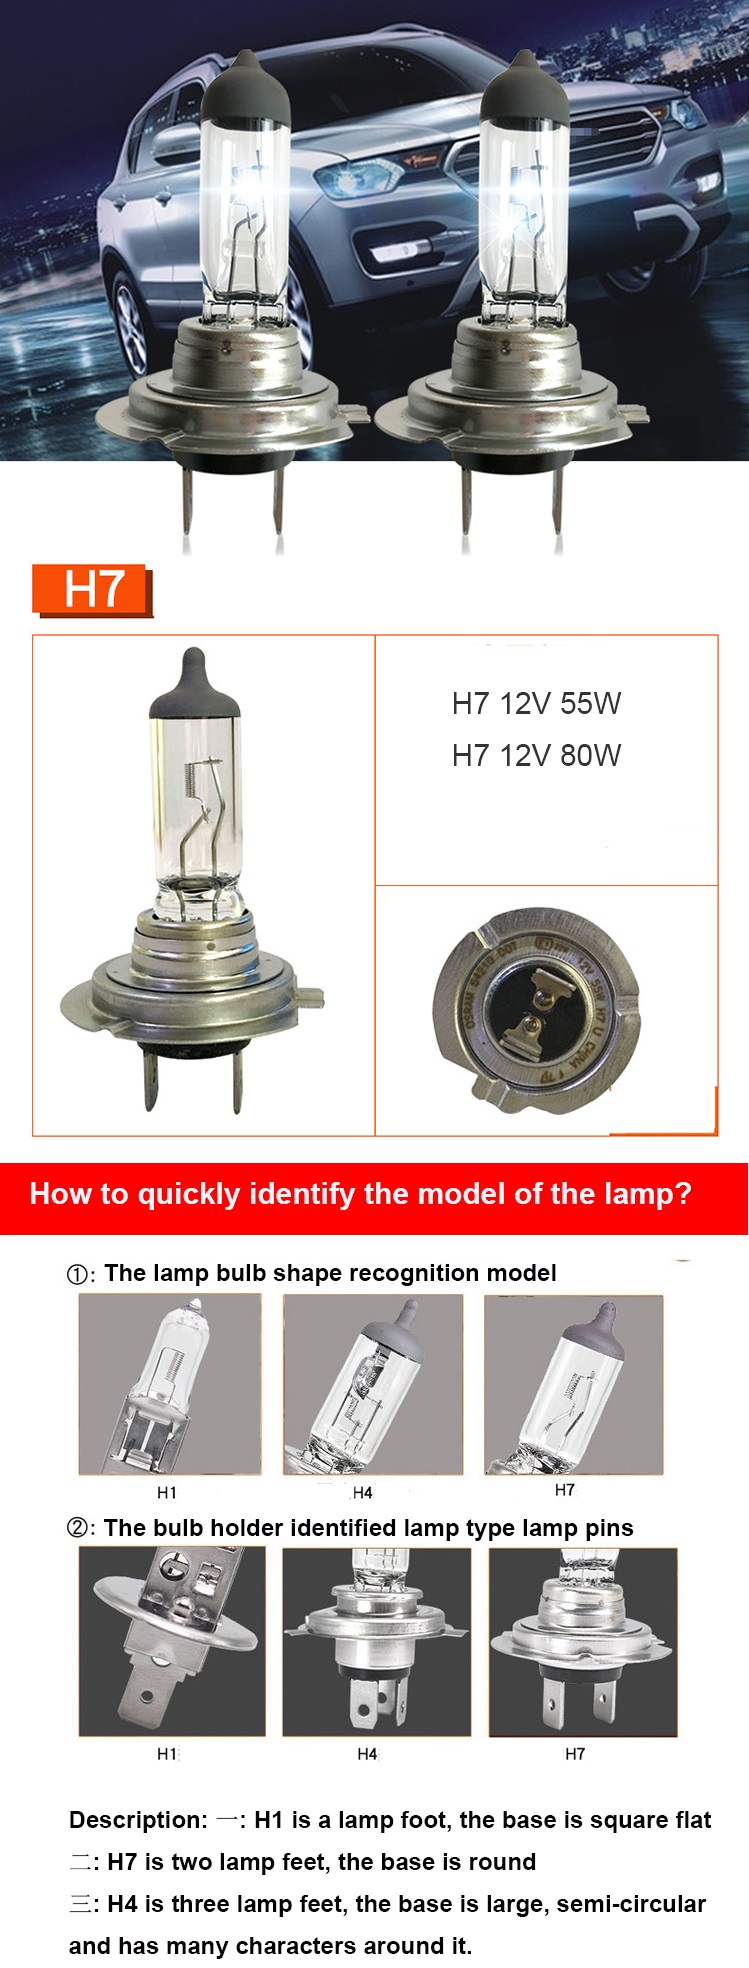 Autolamp 할로겐 H7 인증 12 전압 및 할로겐 램프 유형